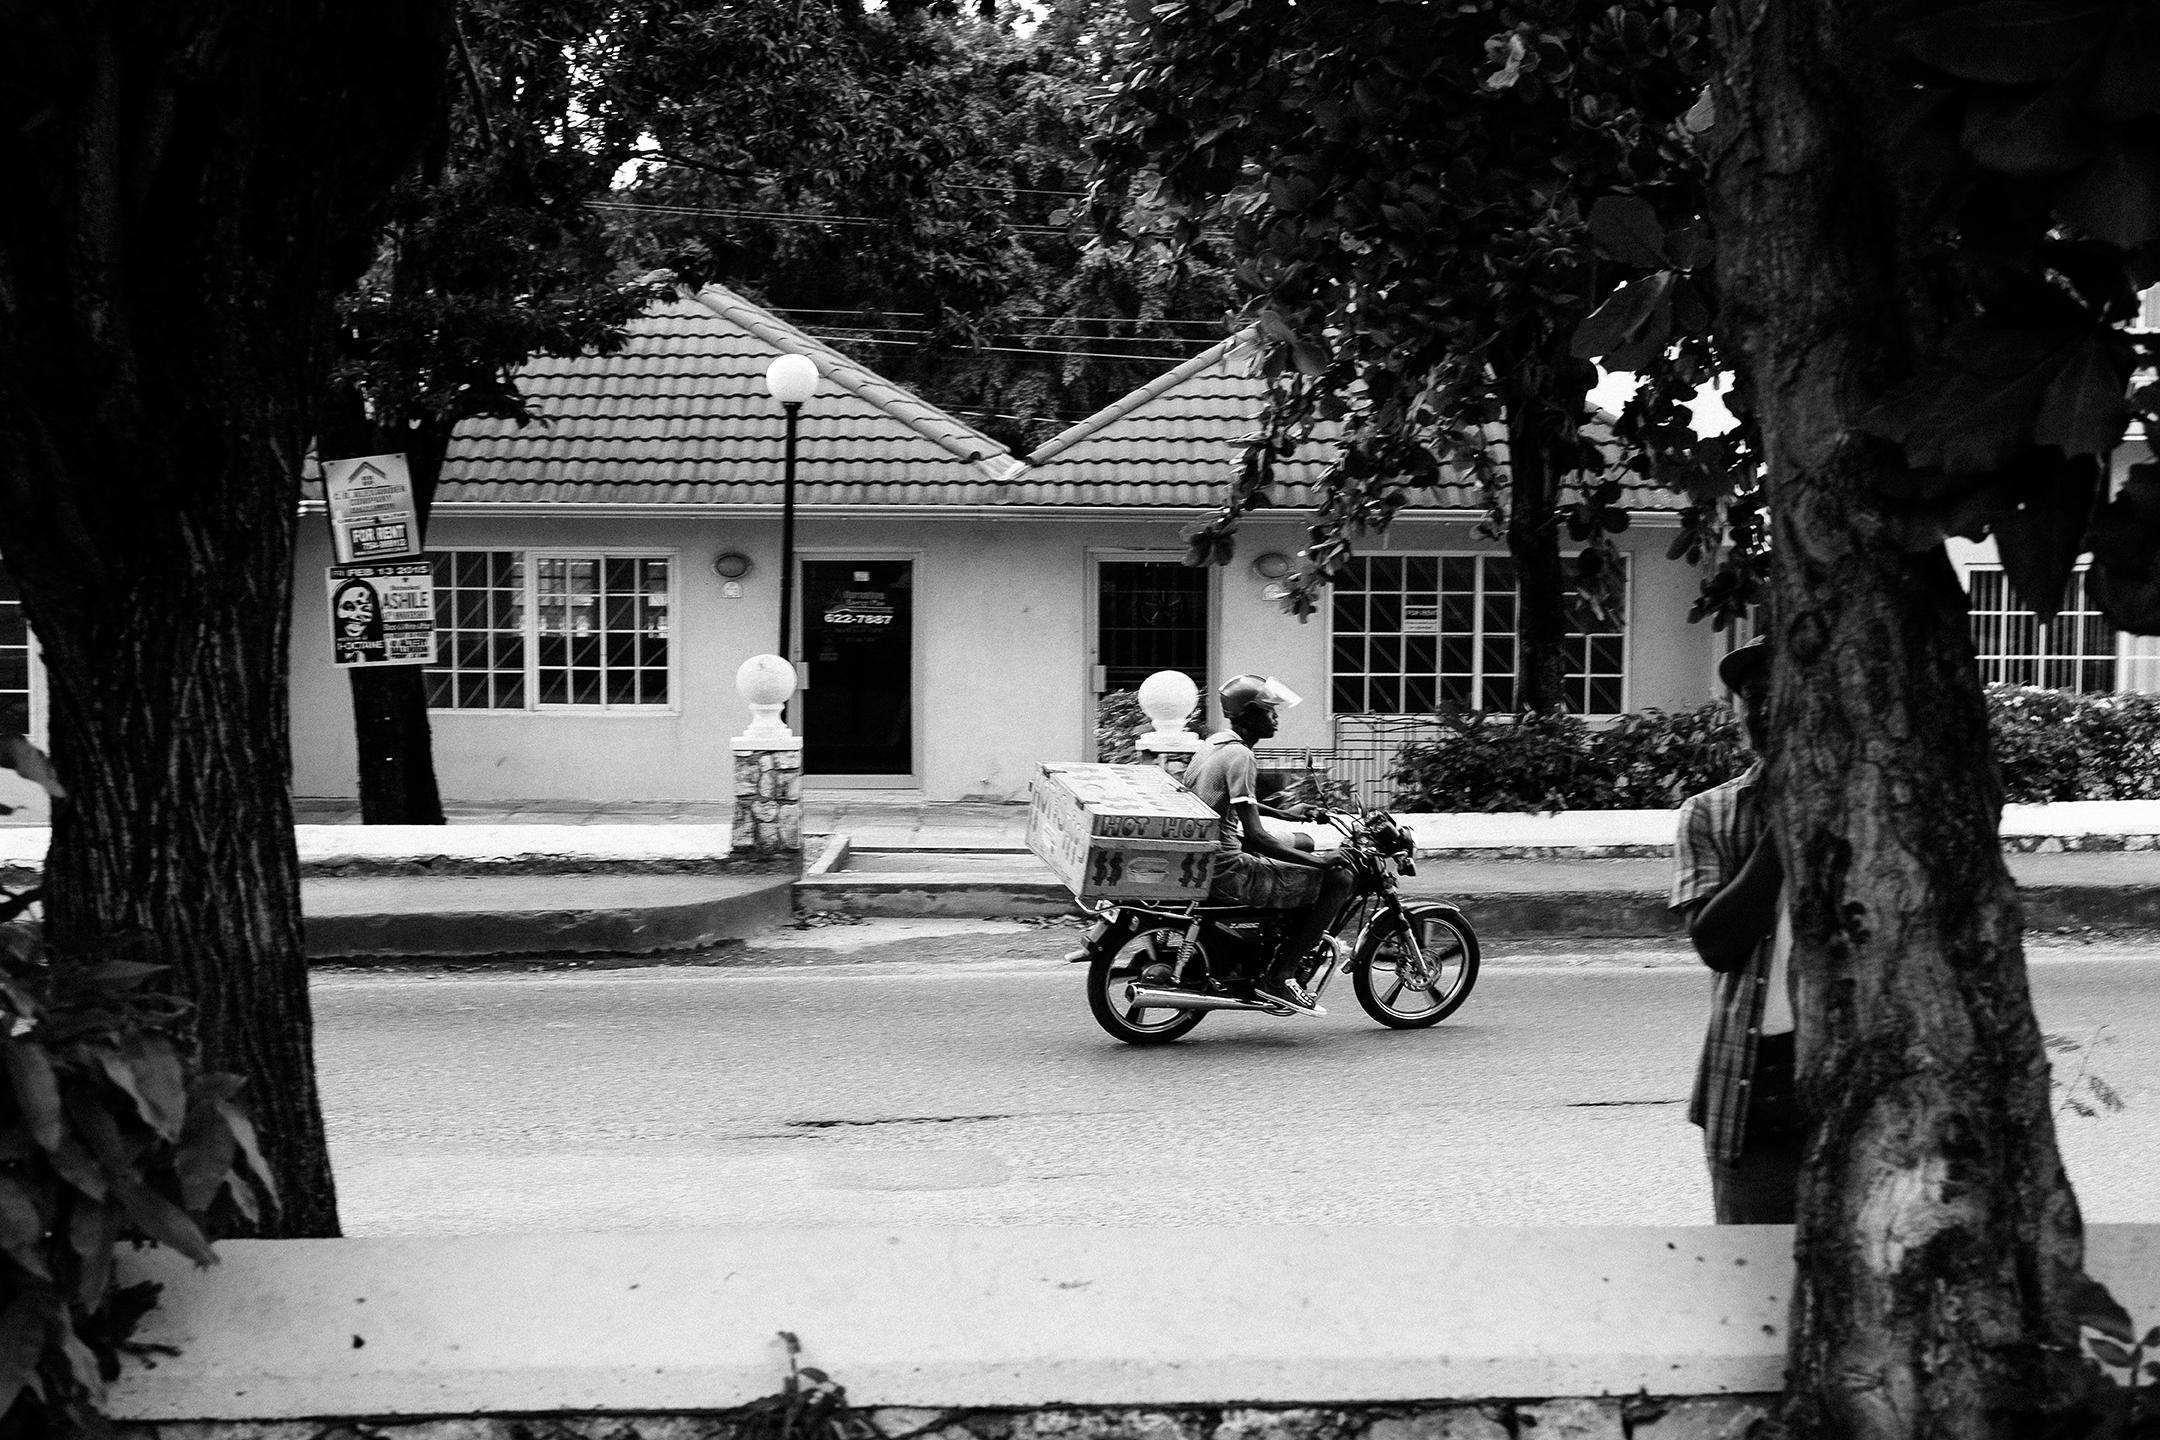 Motorcyclist, Jamaica